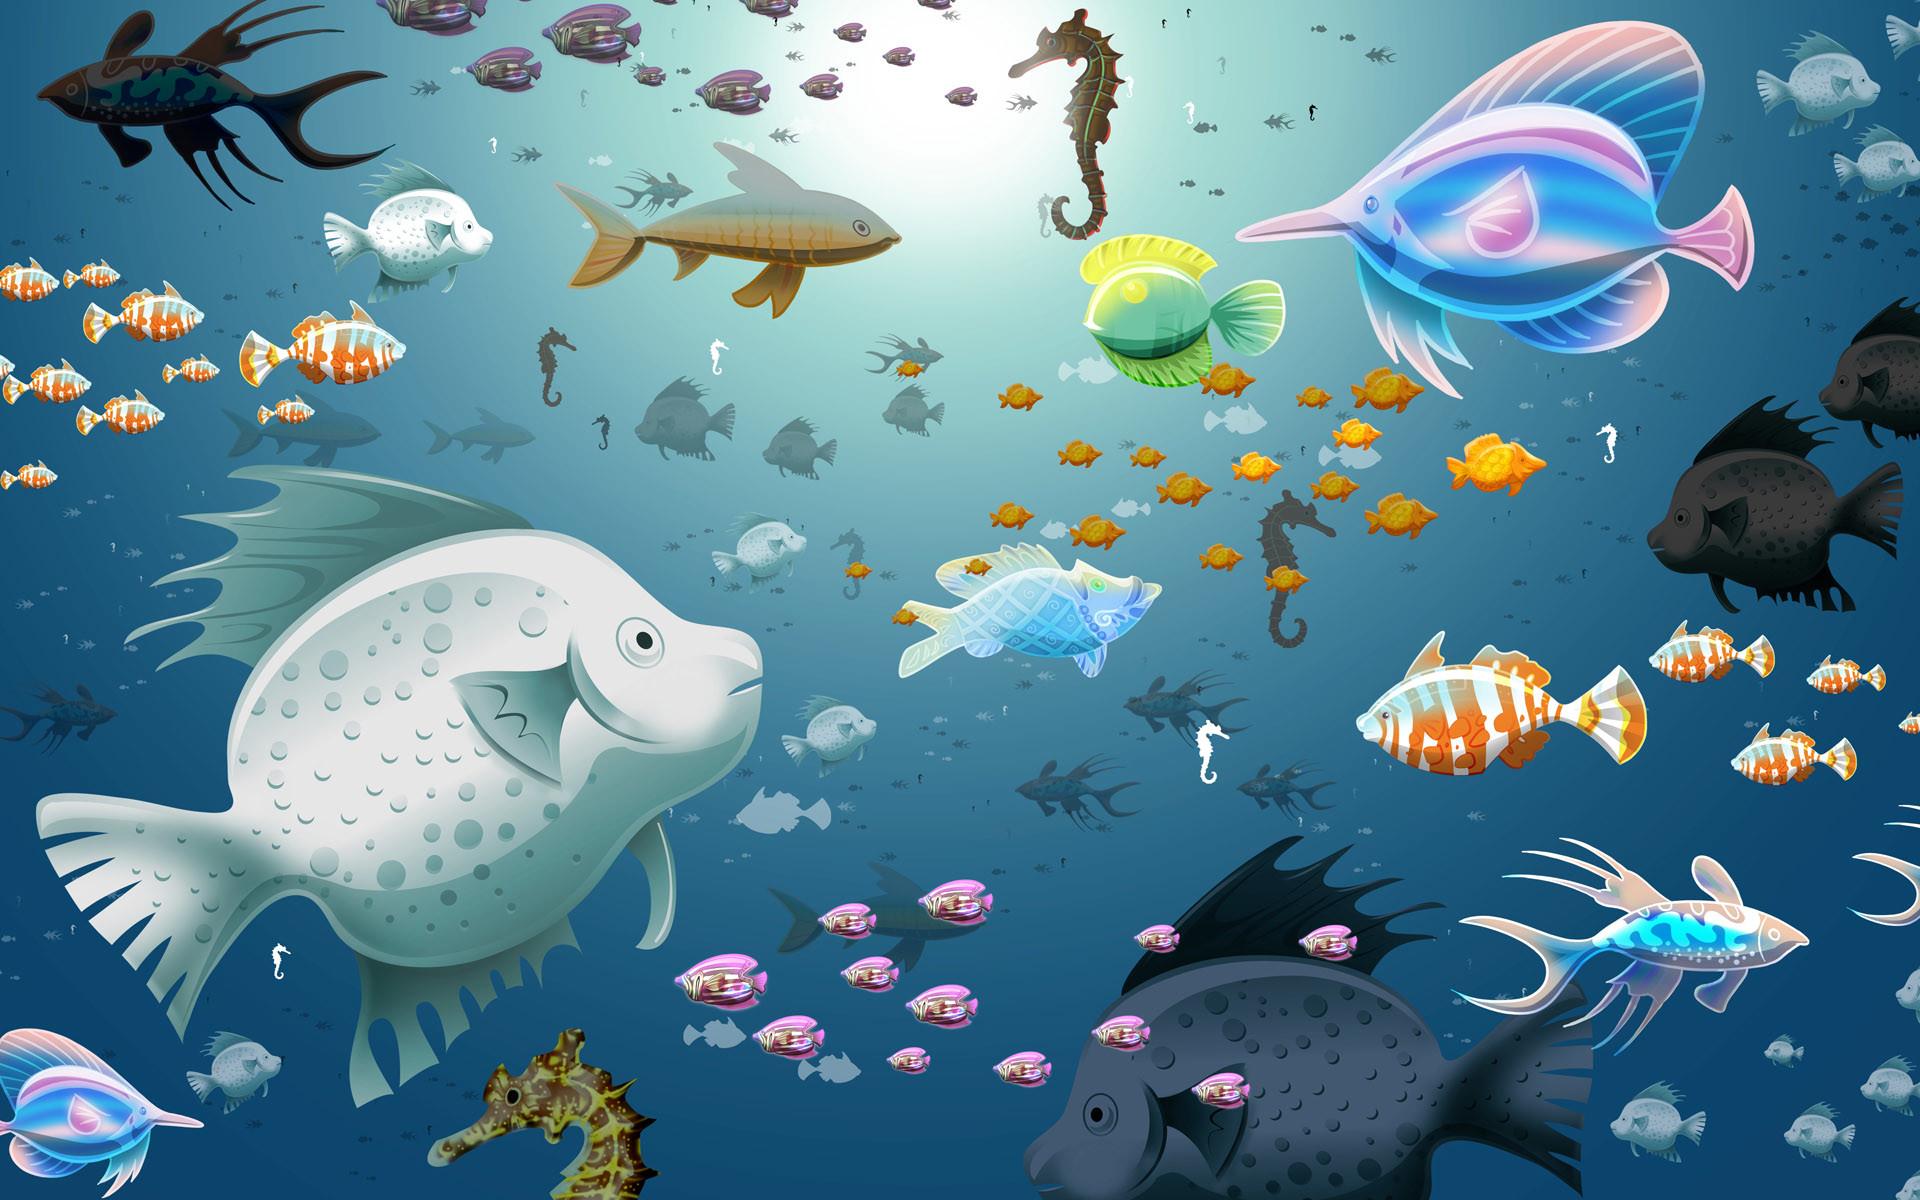 Cartoon Animated Wallpapers Find best latest Cartoon Animated